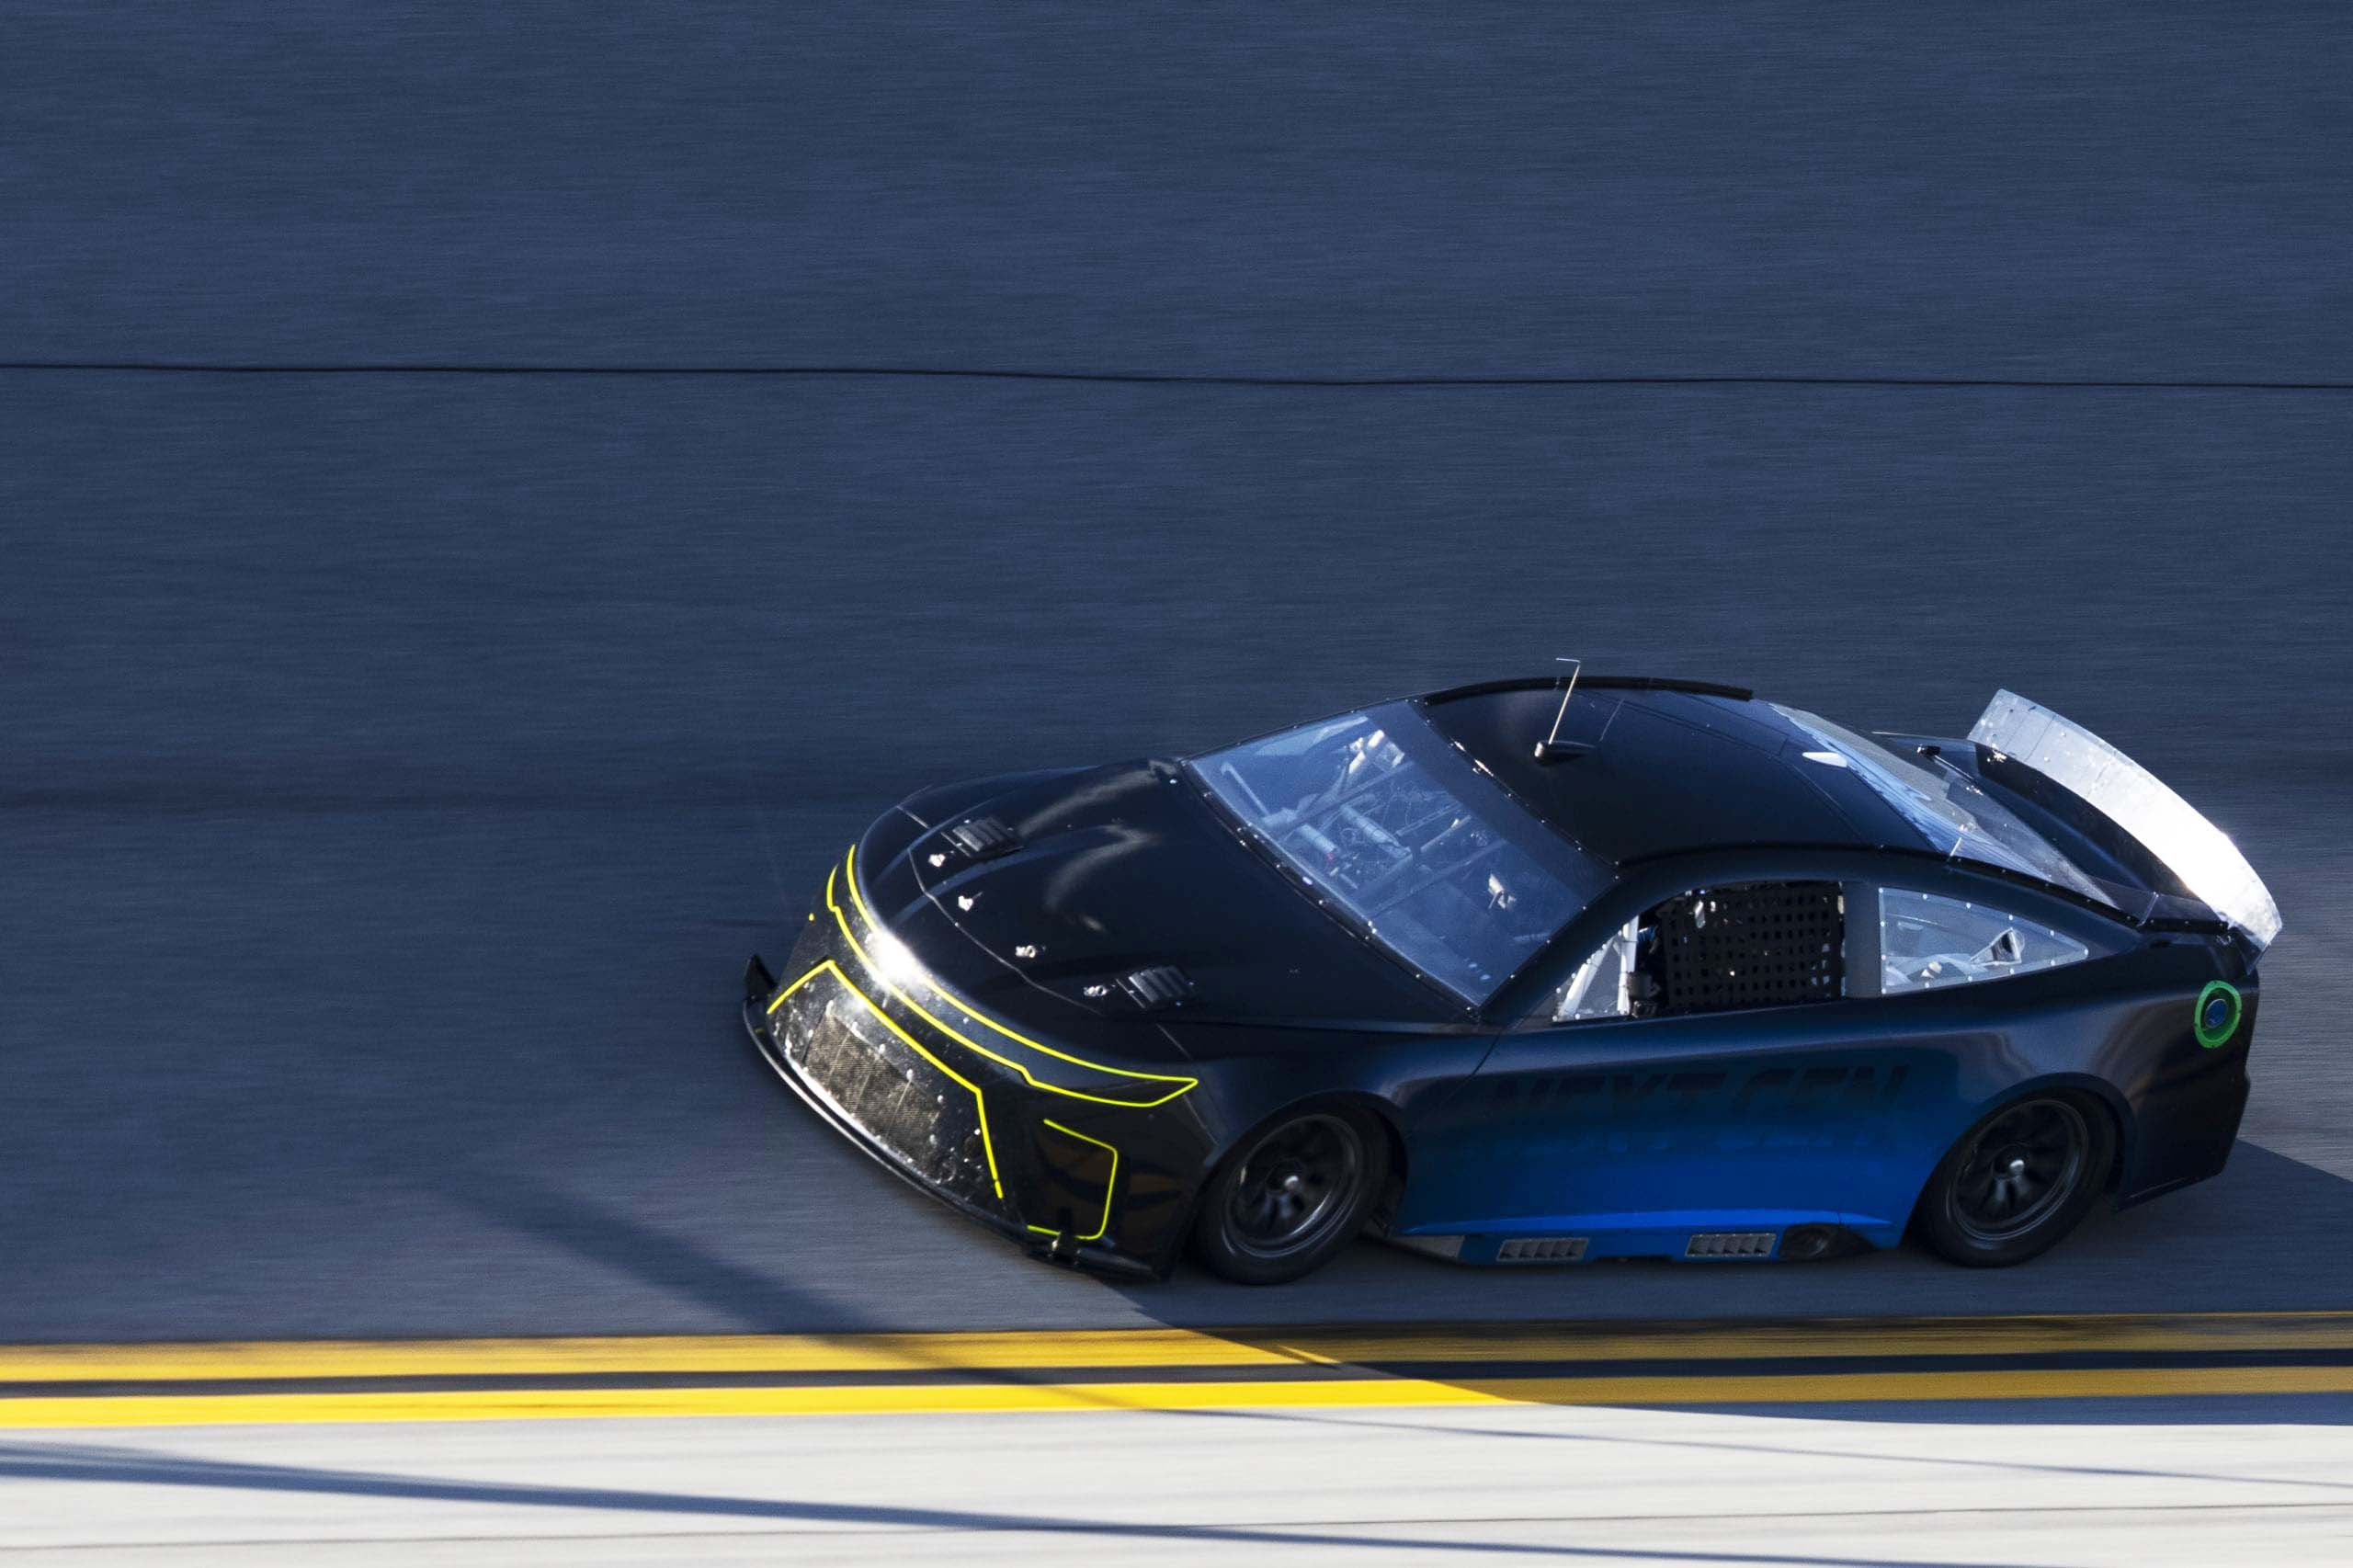 Test at Daytona International Speedway - NASCAR Next Gen